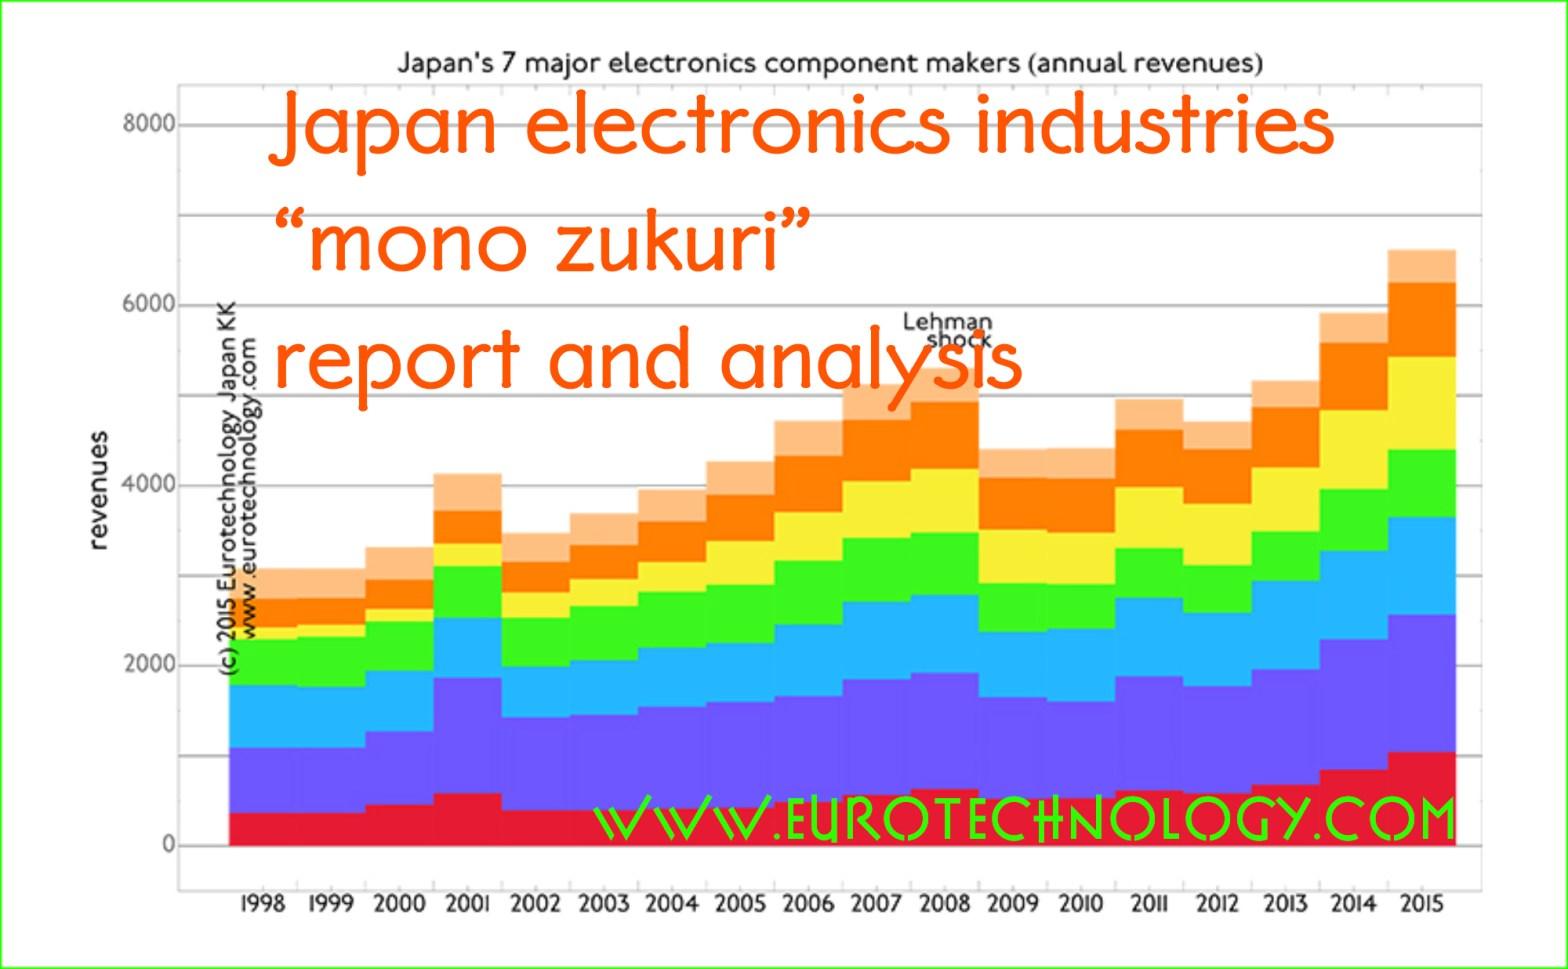 eurotechnology report on Japan's electronics industries - mono zukuri